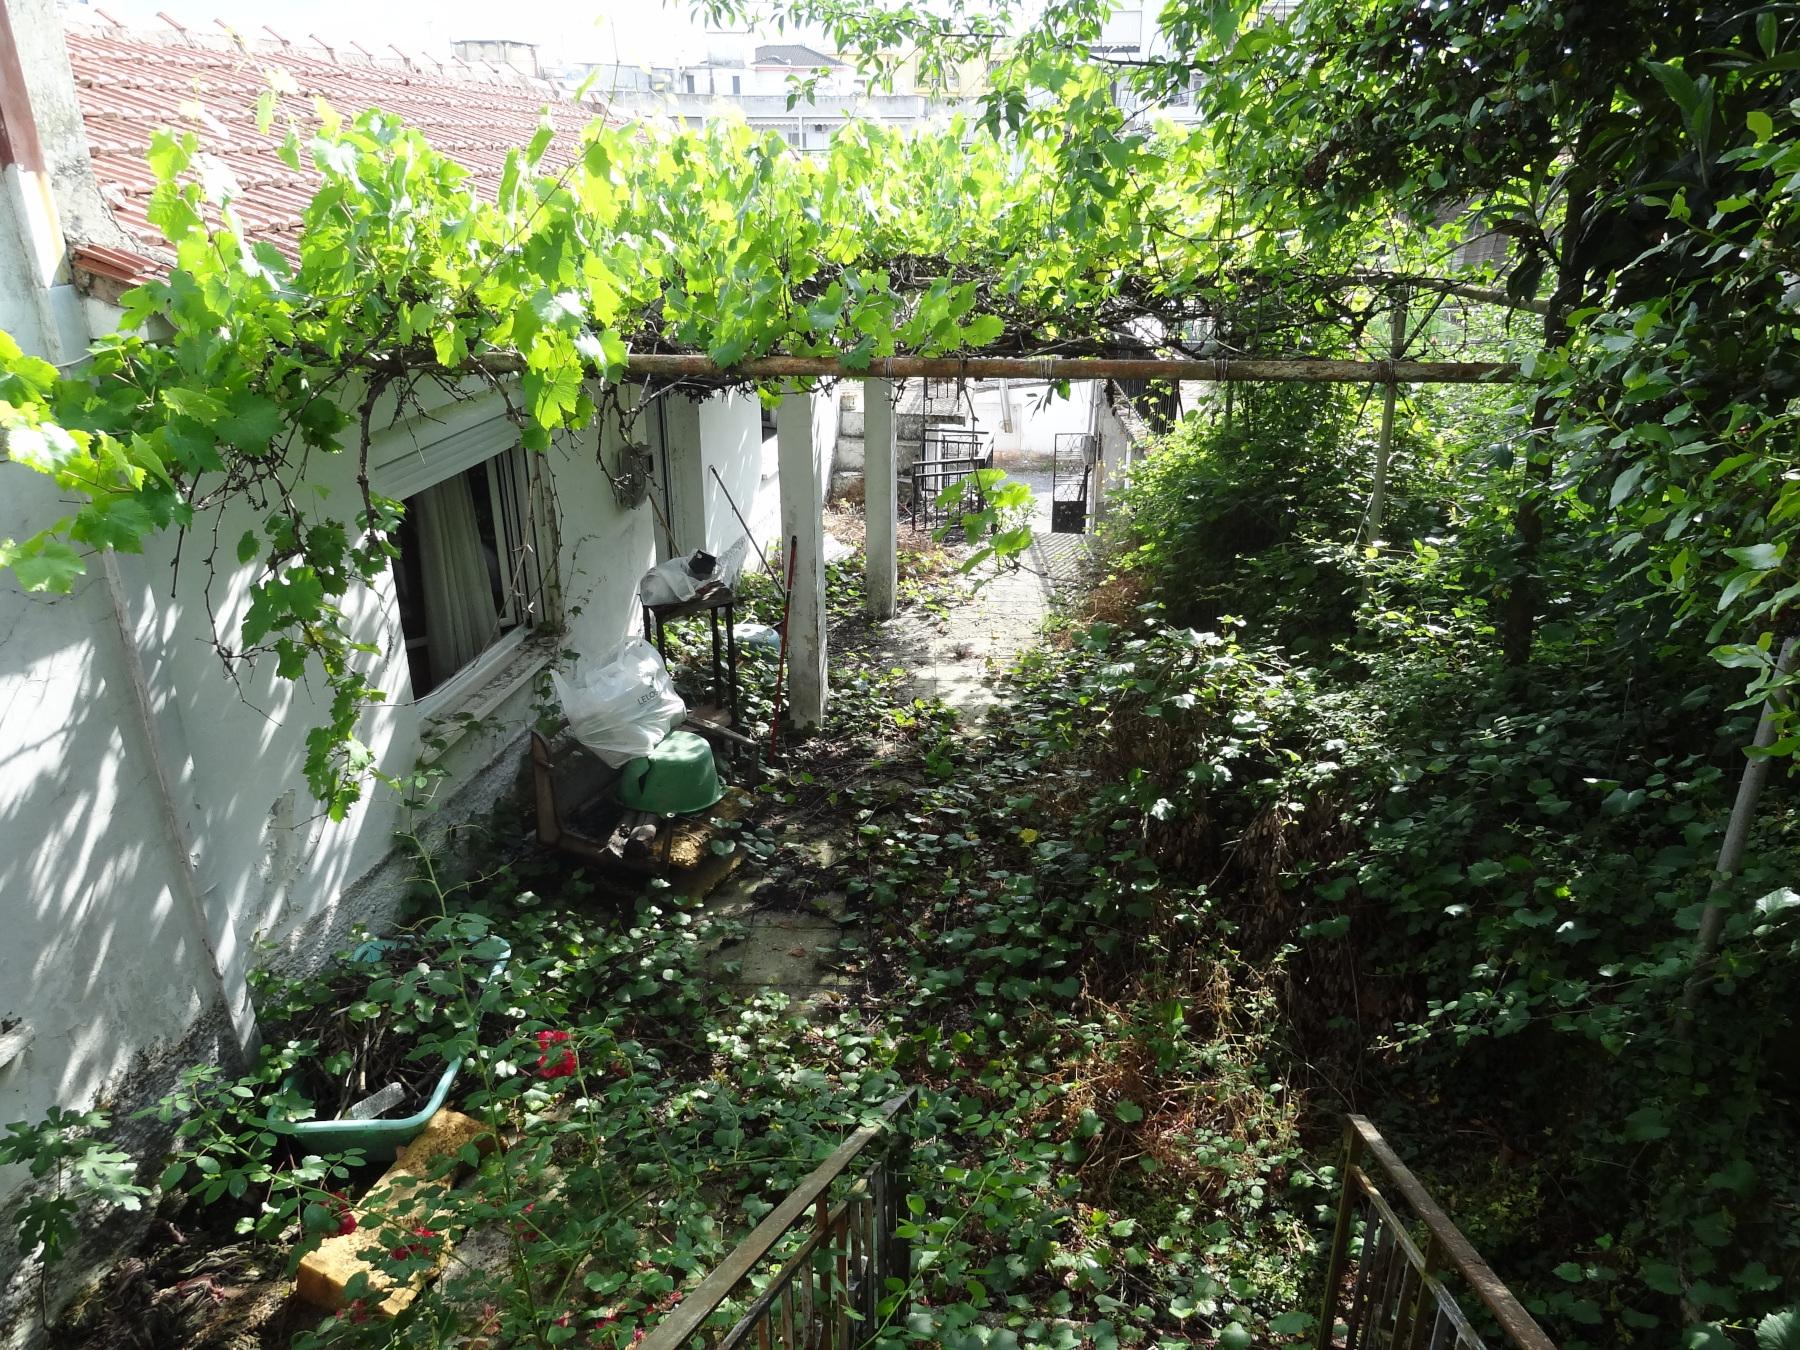 For sale a plot of 222 sq.m. with S.D. 0.8 with an old building in the area of Laspotopos, Ioannina